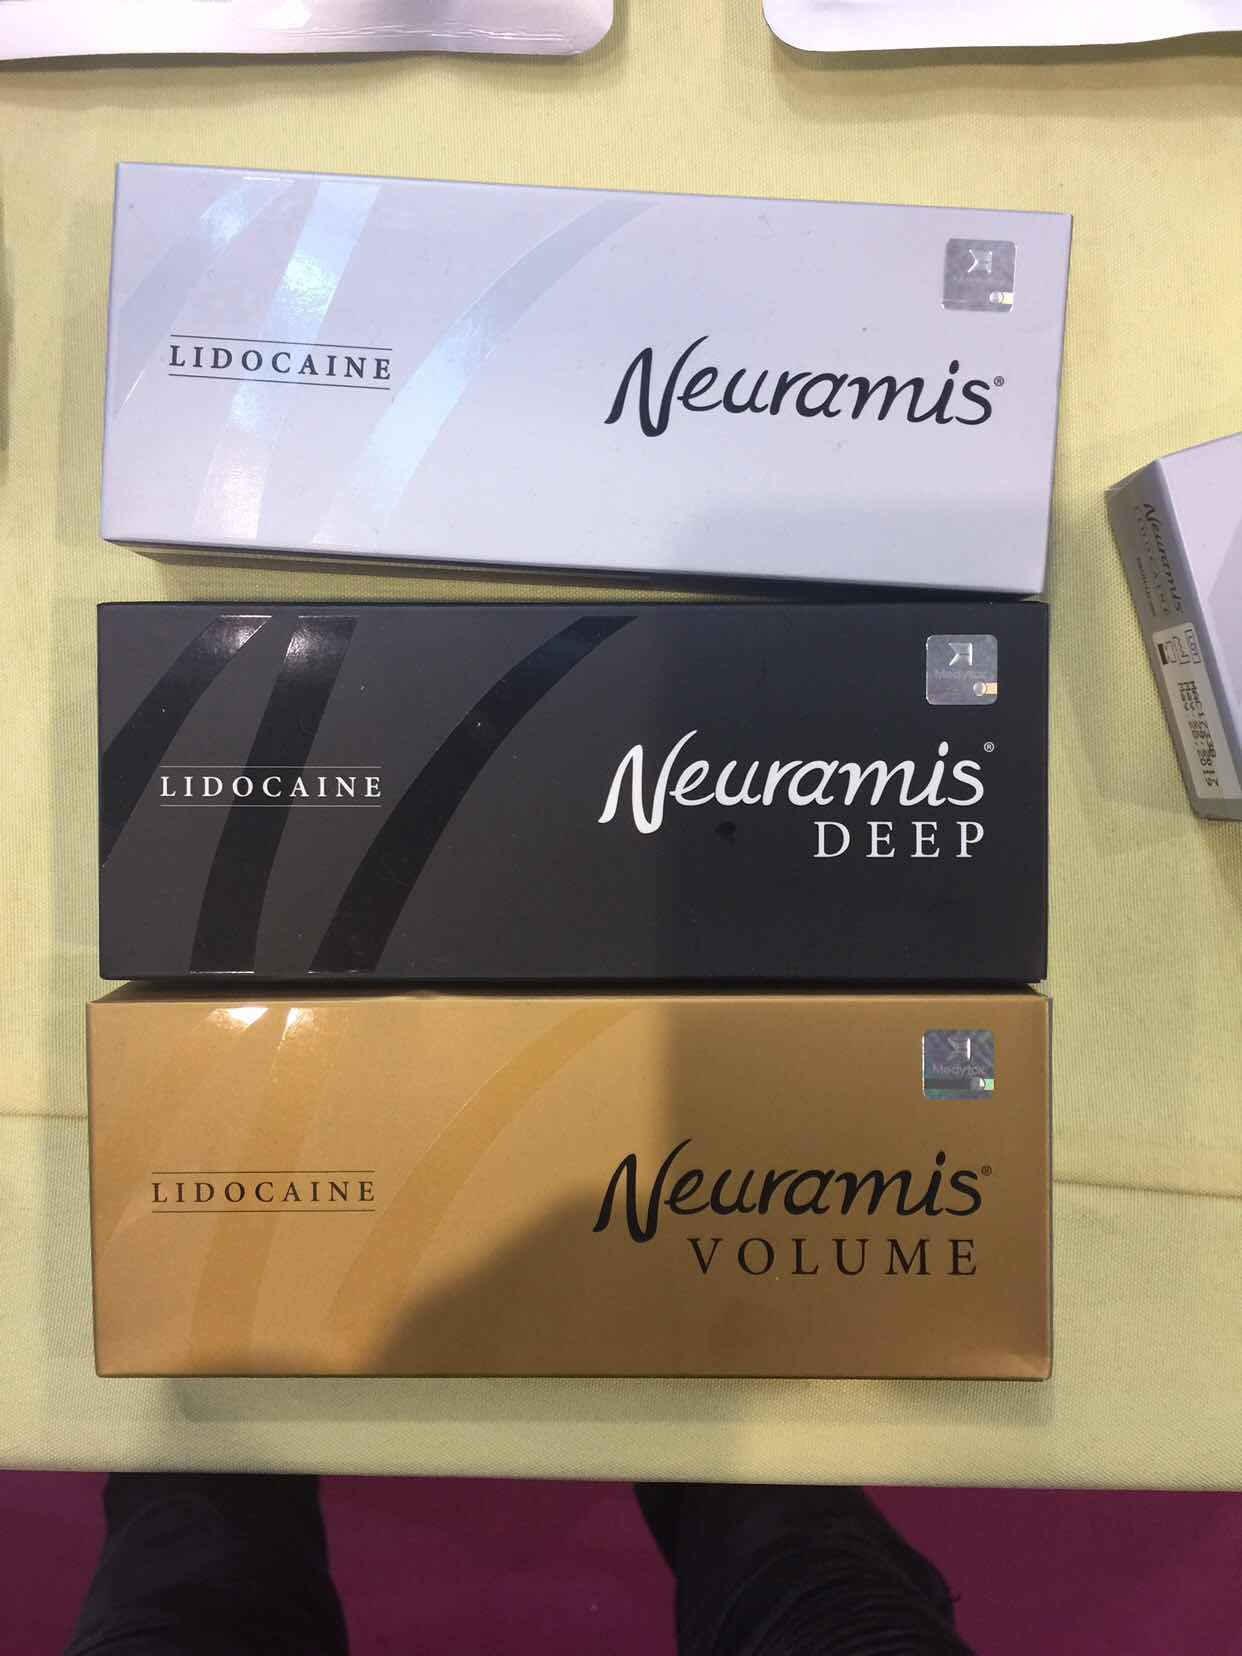 2017 Top Sale Hyaluronic Acid Neuramis Dermal Filler